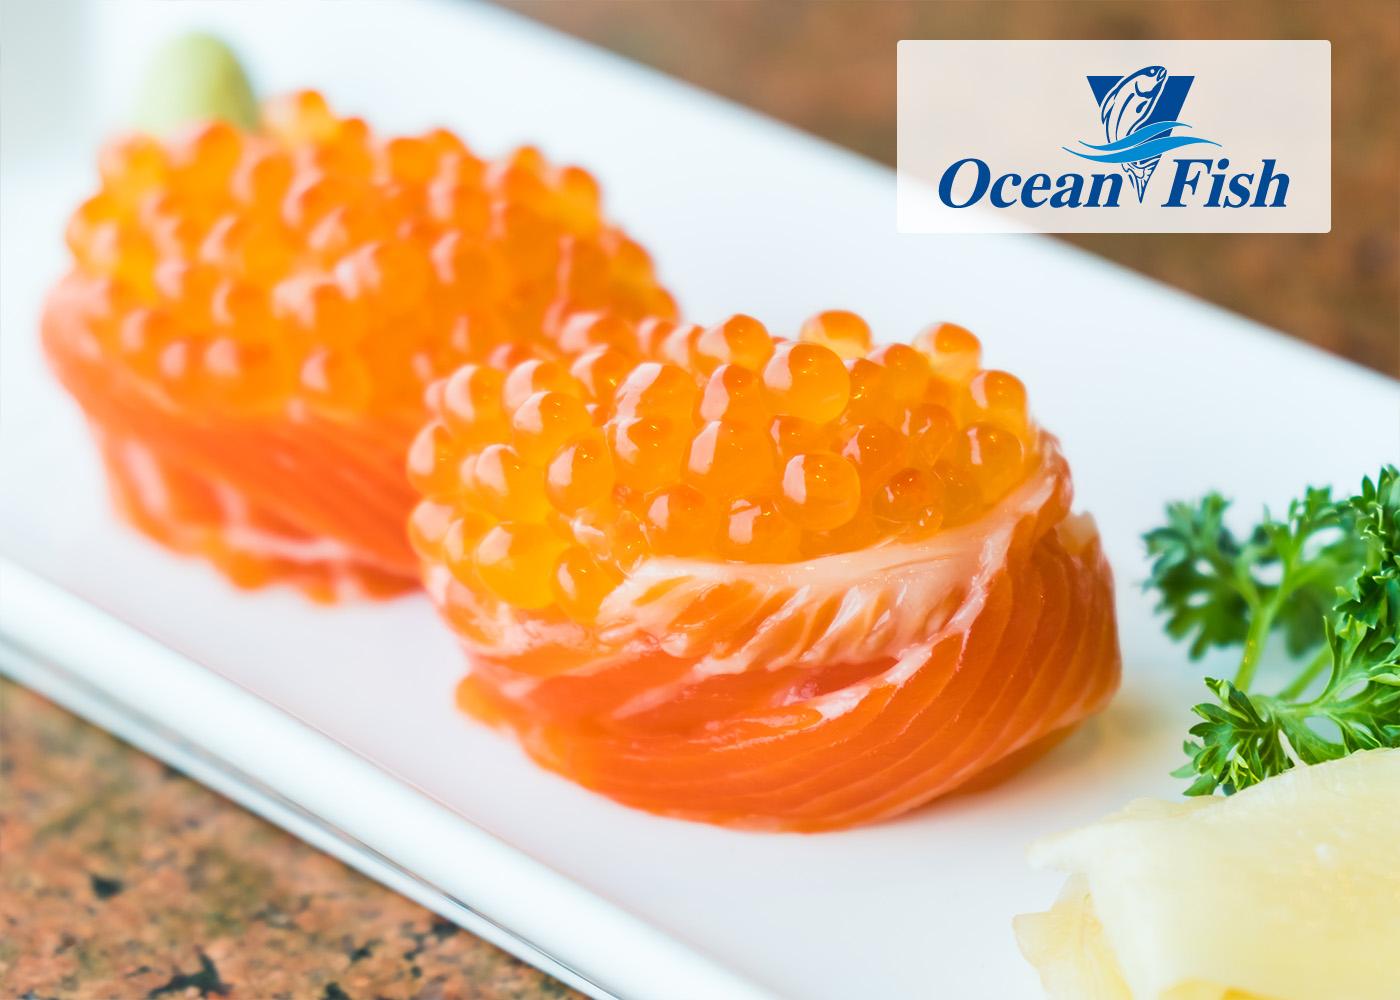 ocean fish client erp wms sistem software pentru fmcg distributie si productie bunuri de larg consum retail